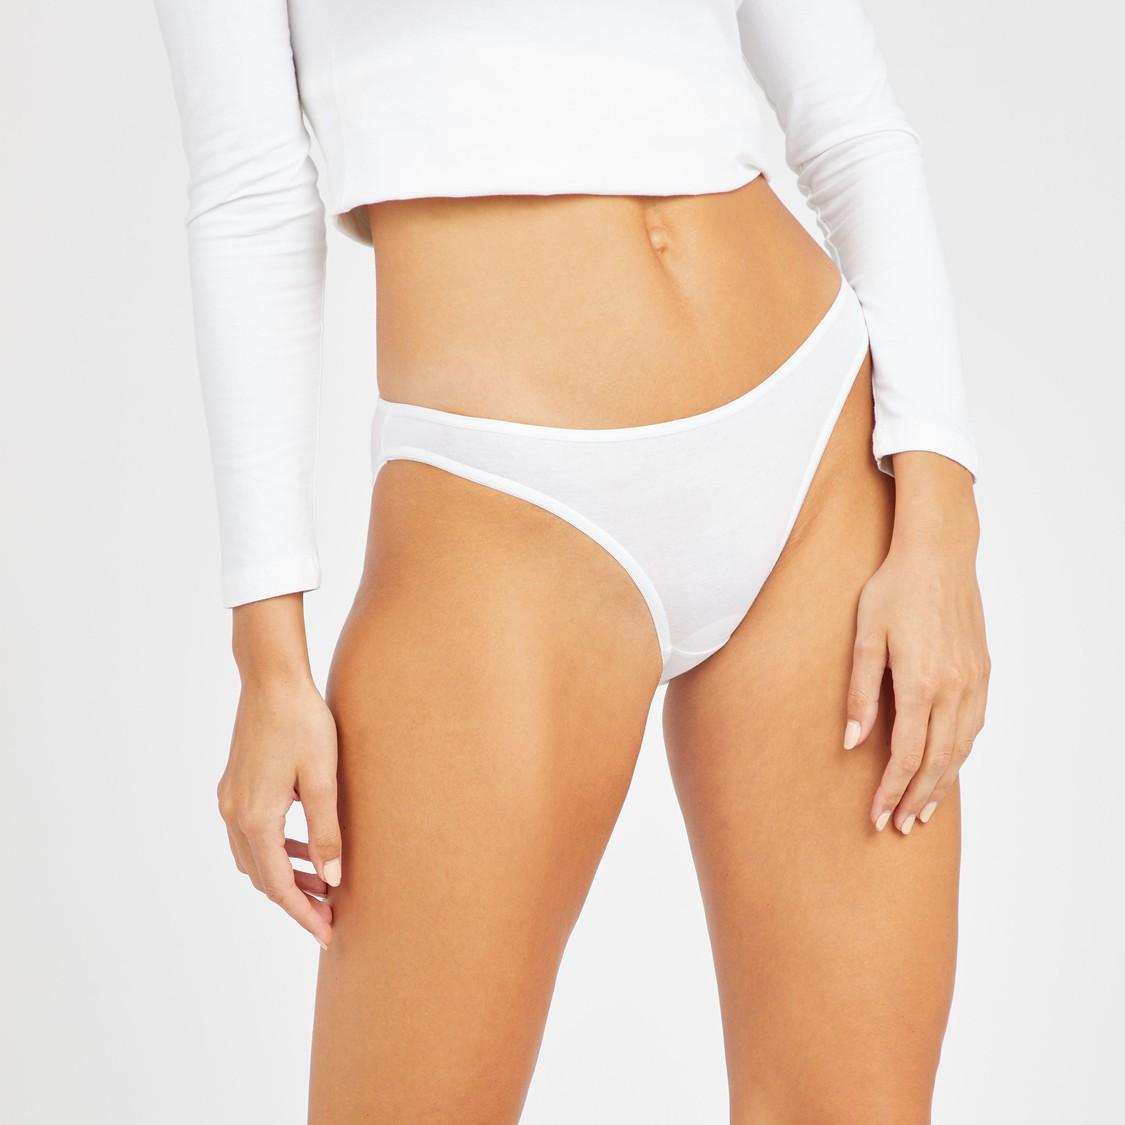 Set of 5 - Assorted Bikini Briefs with Elasticised Waistband